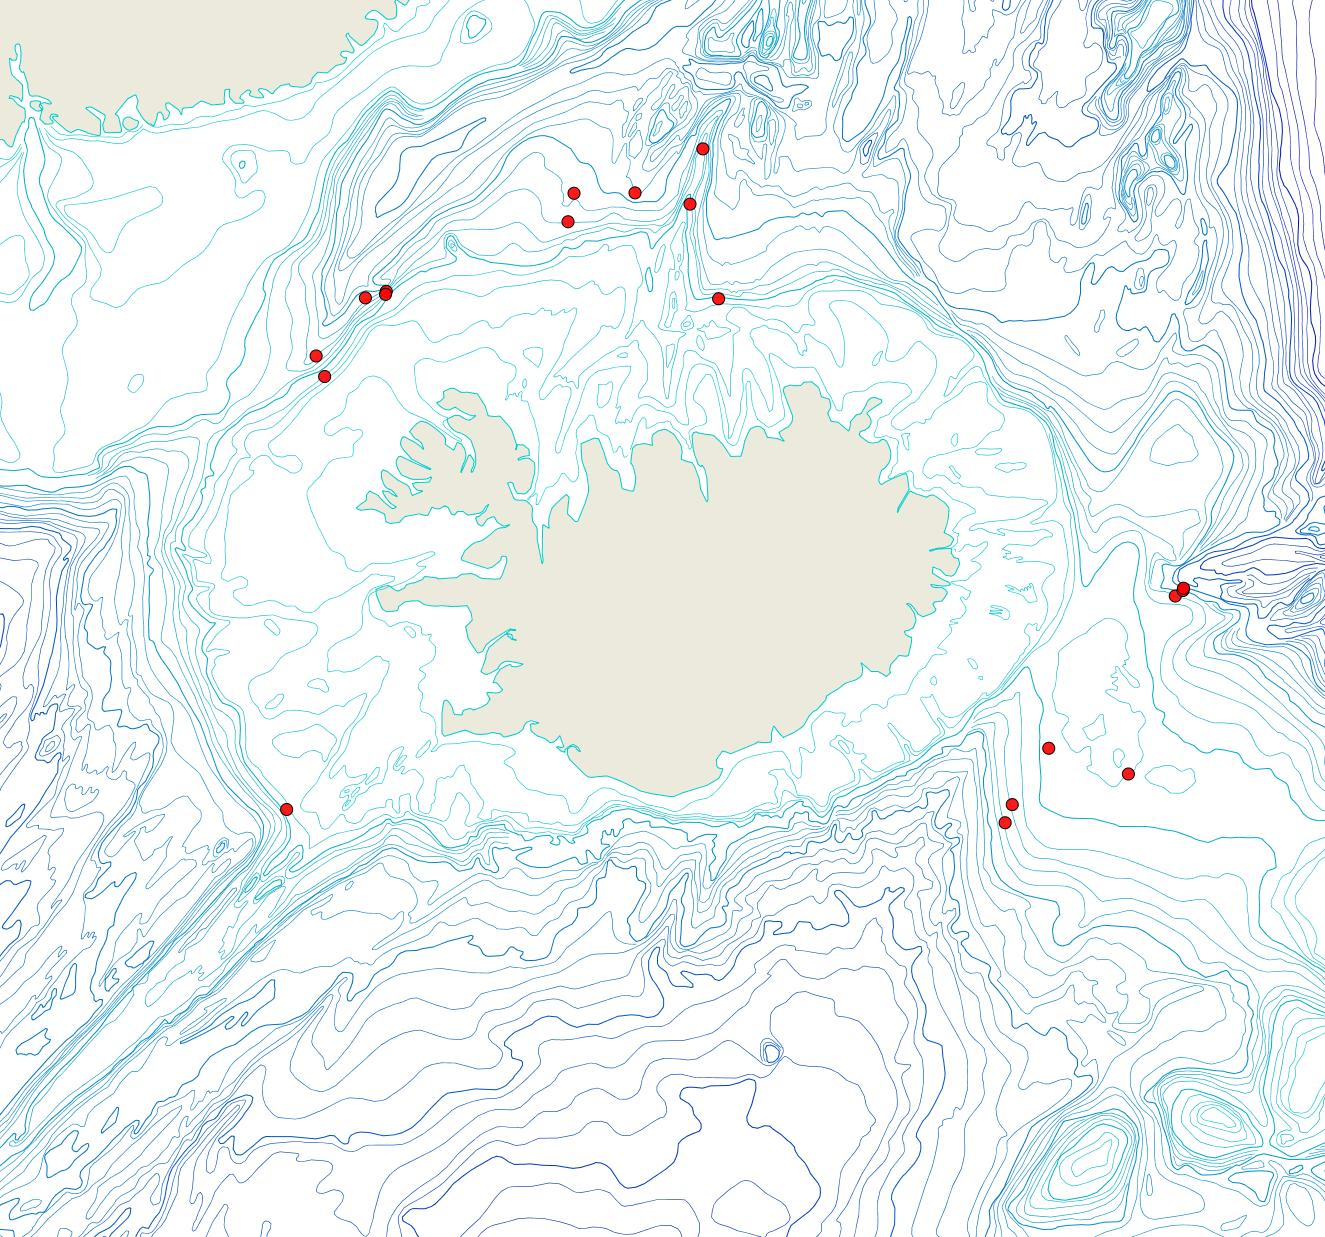 Útbreiðsla Palmiskenea aquilonia(Bioice samples, red dots)